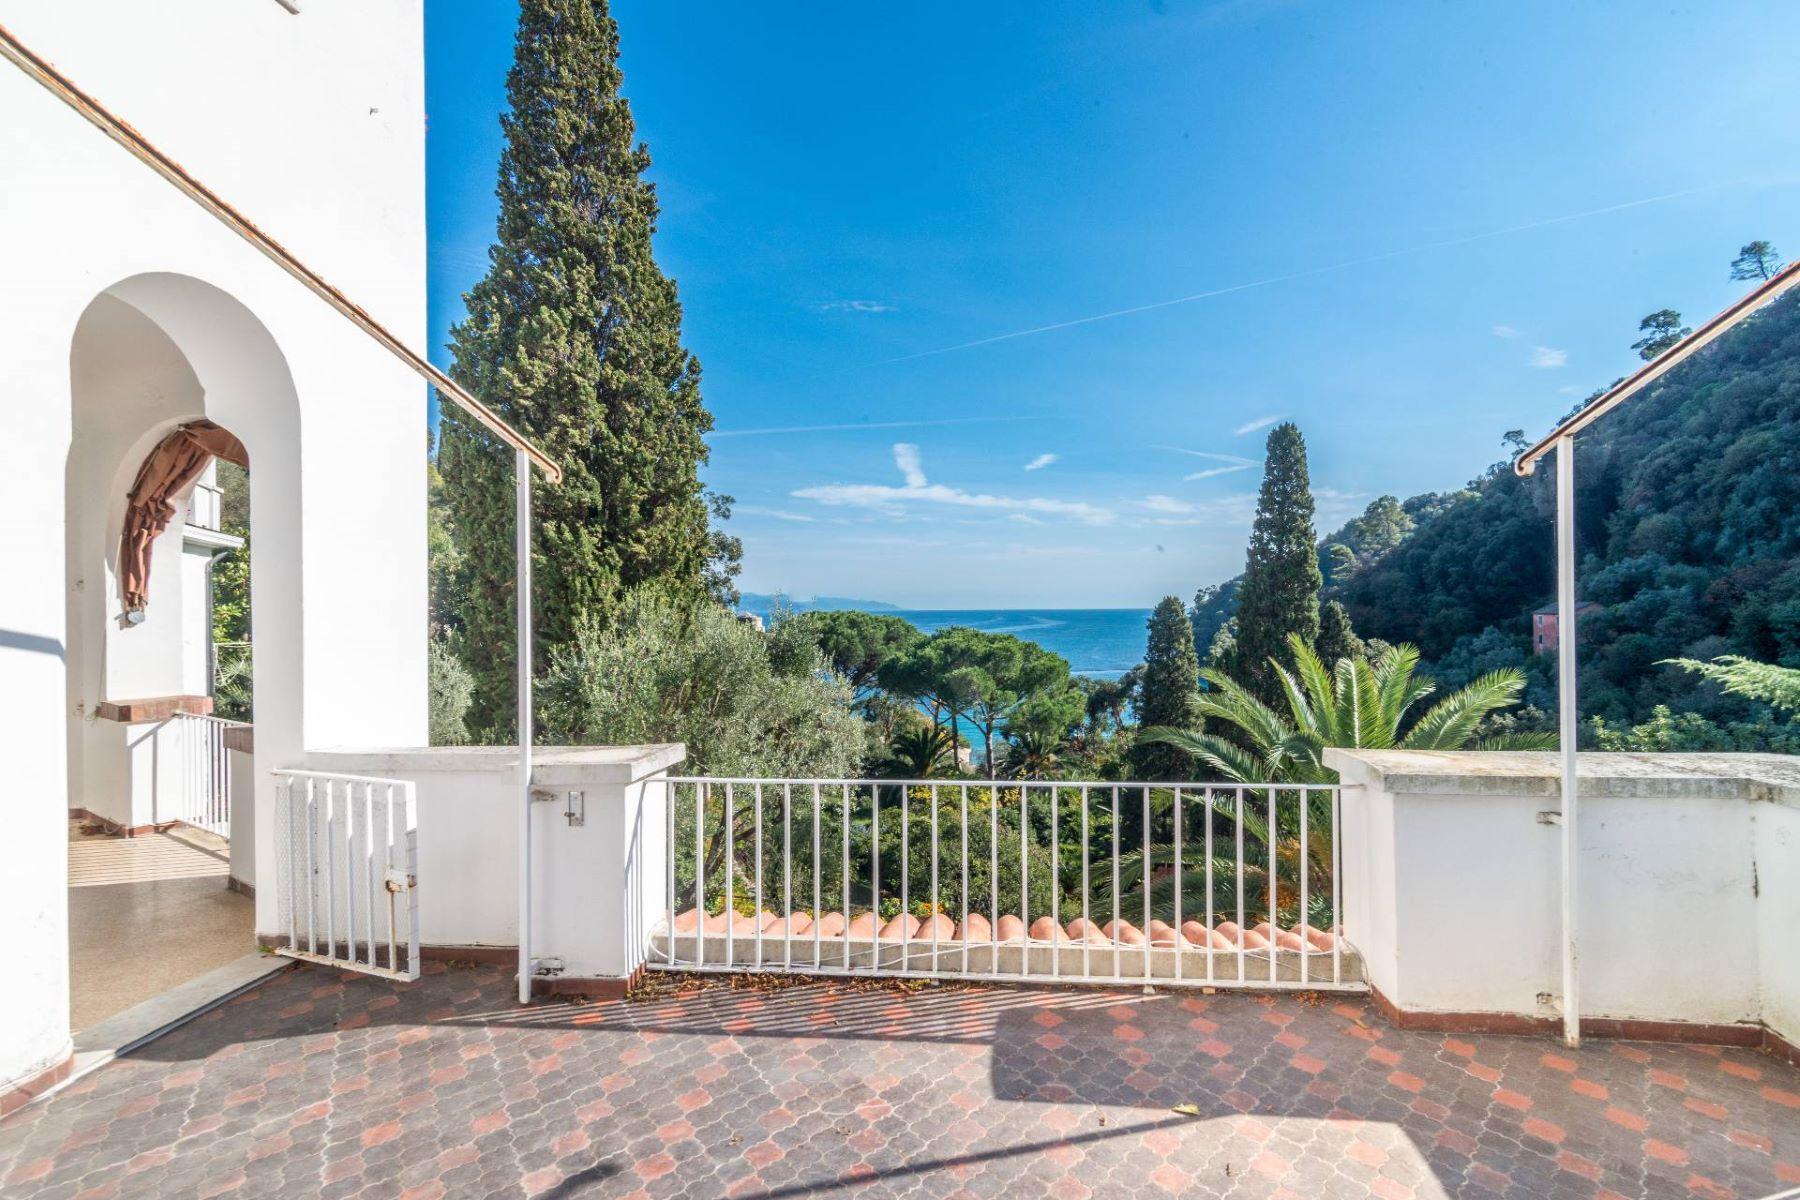 Apartments for Sale at Exclusive apartment inside a villa in Paraggi Santa Margherita Ligure, Genoa Italy